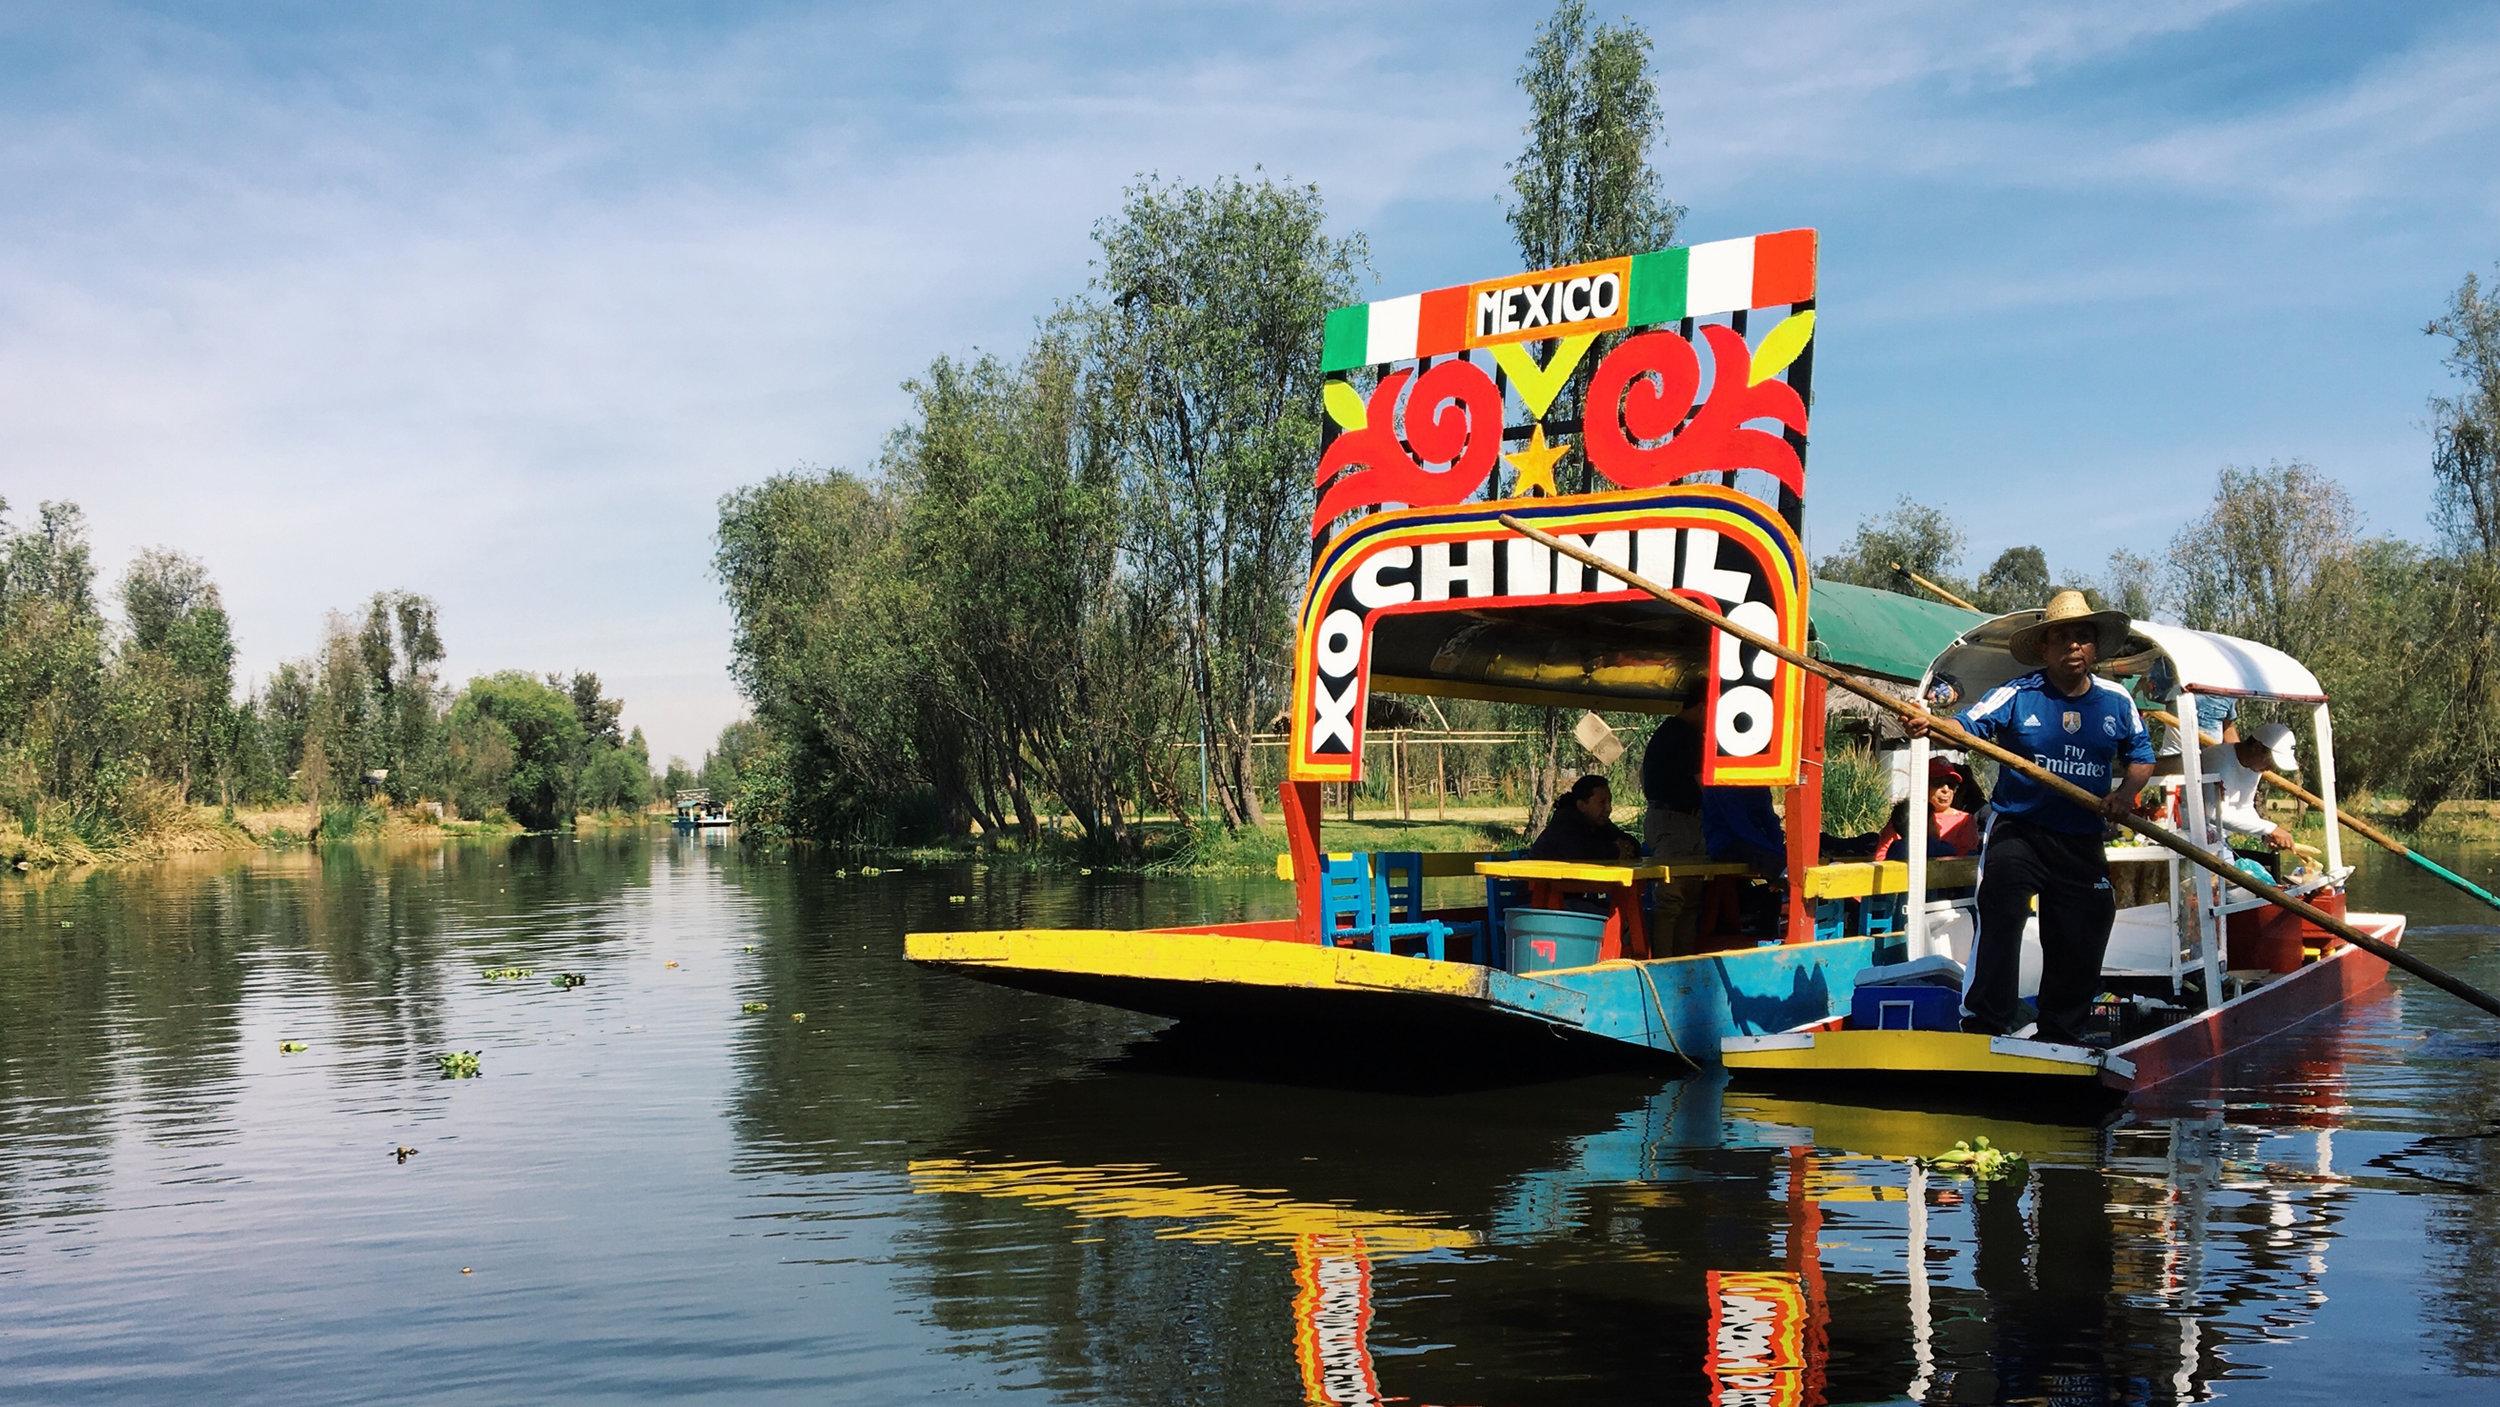 xochimilco 2.jpg